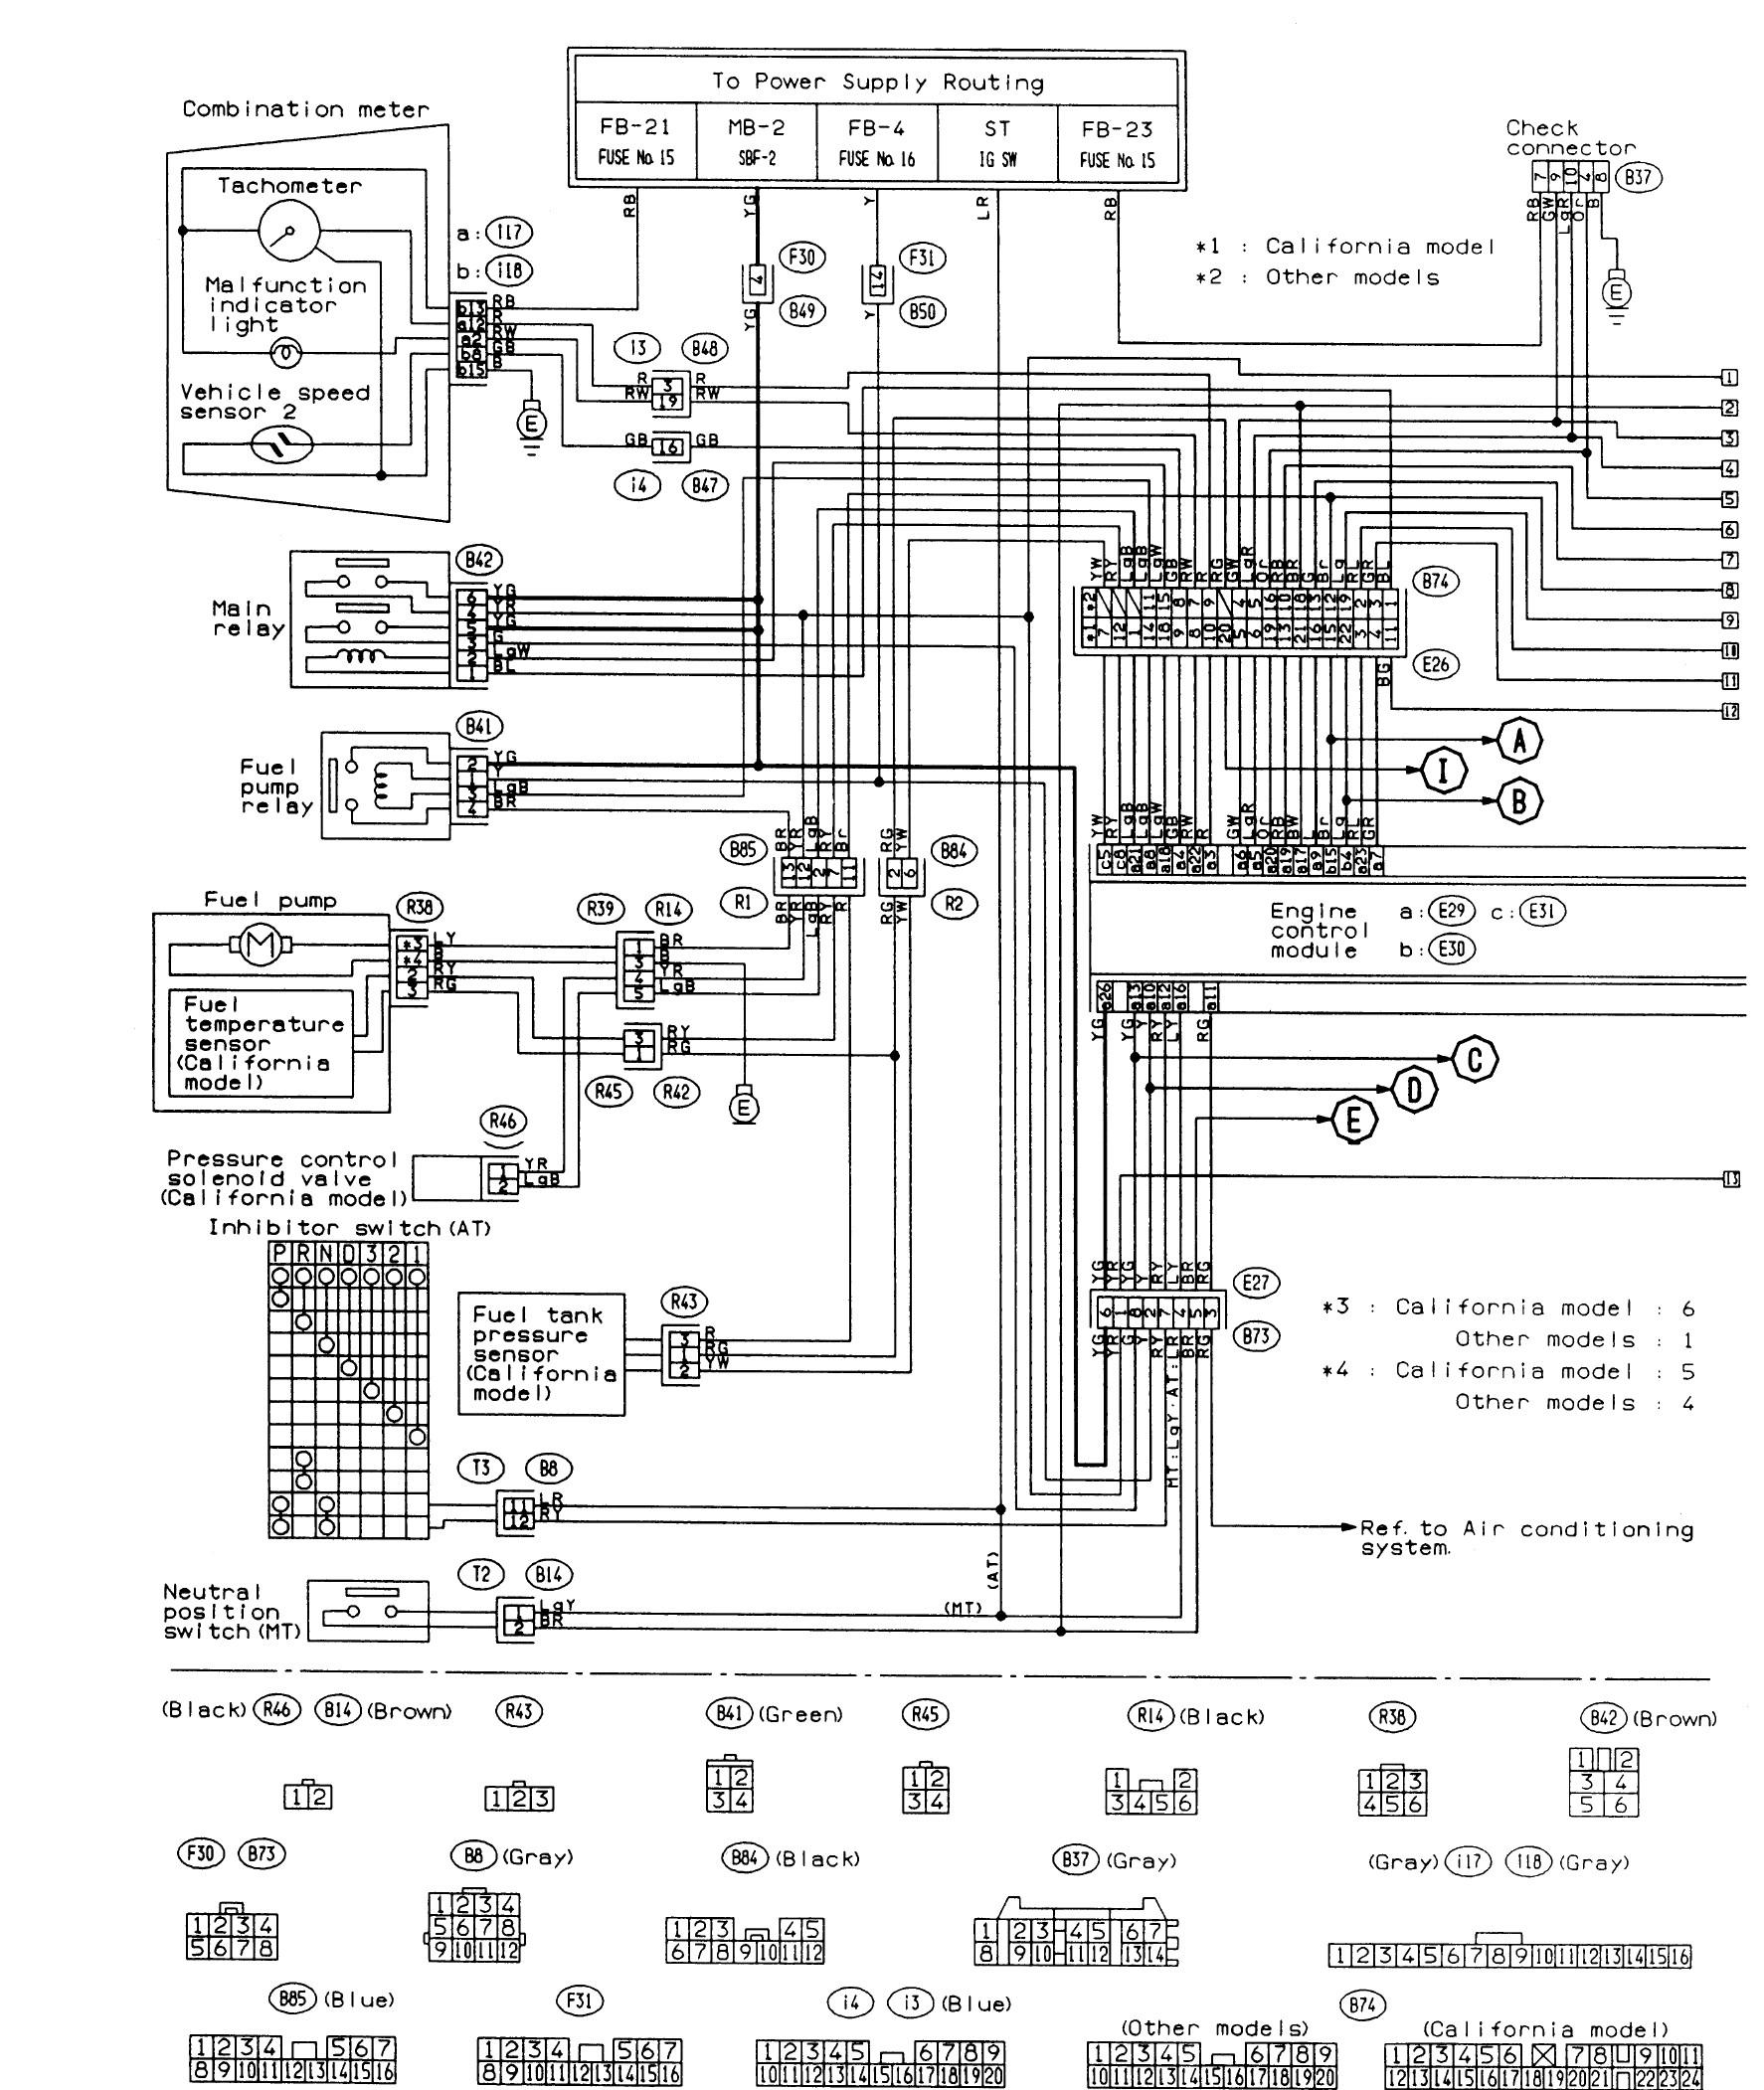 2004 subaru forester engine diagram my wiring diagram rh detoxicrecenze com 2004  4Runner Sunroof Wiring-Diagram Double Pole Relay Diagram